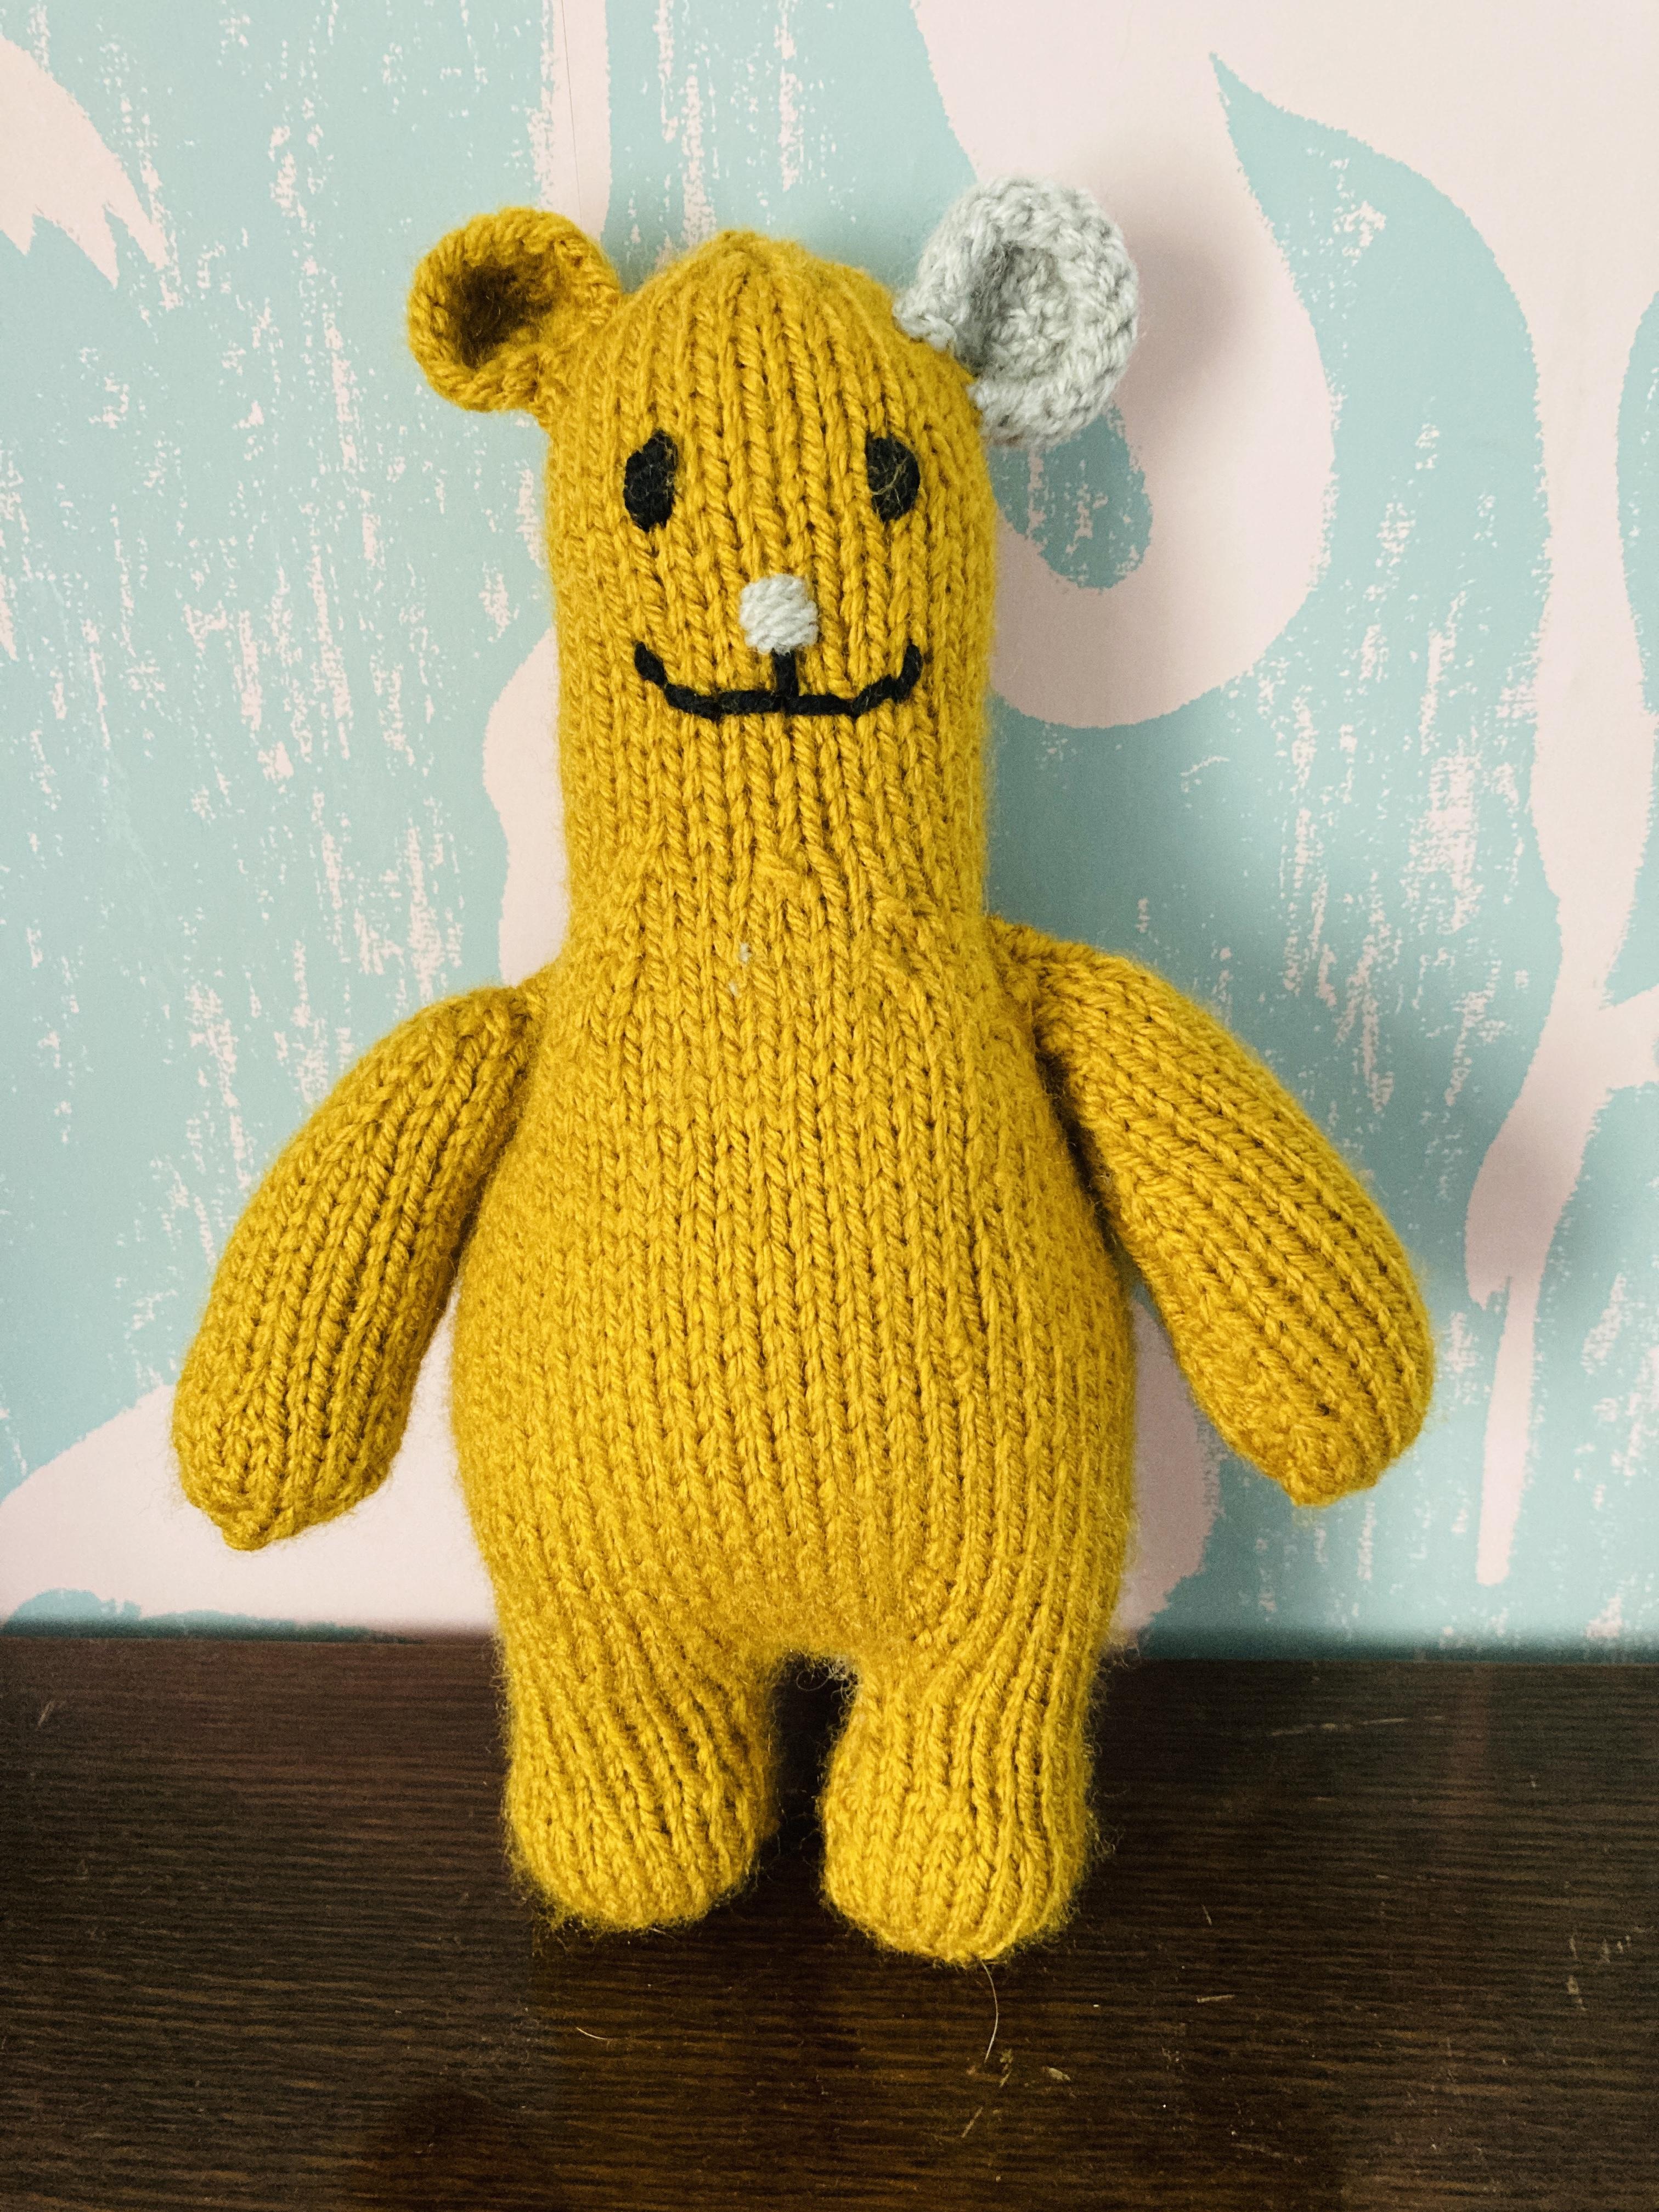 Handmade 'Hygge' Knitted Teddies